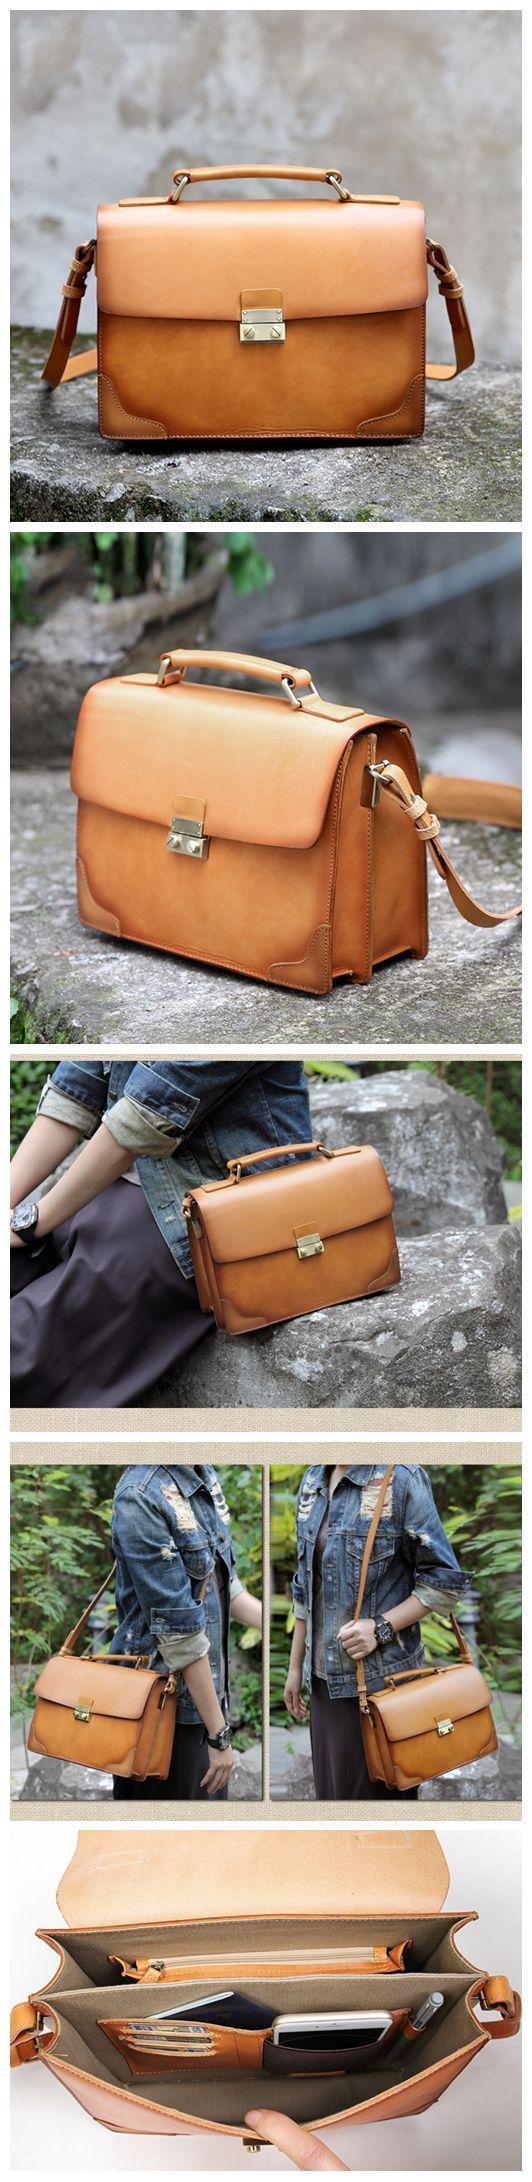 Handmade Brown Leather Messenger Handbag Crossbody Bag Small Satchel AK07 Overview: Design: Vintage Vegetable Tanned Leather Messenger In Stock: 4-5 days For Making Include: Only Messenger Bag Custom: